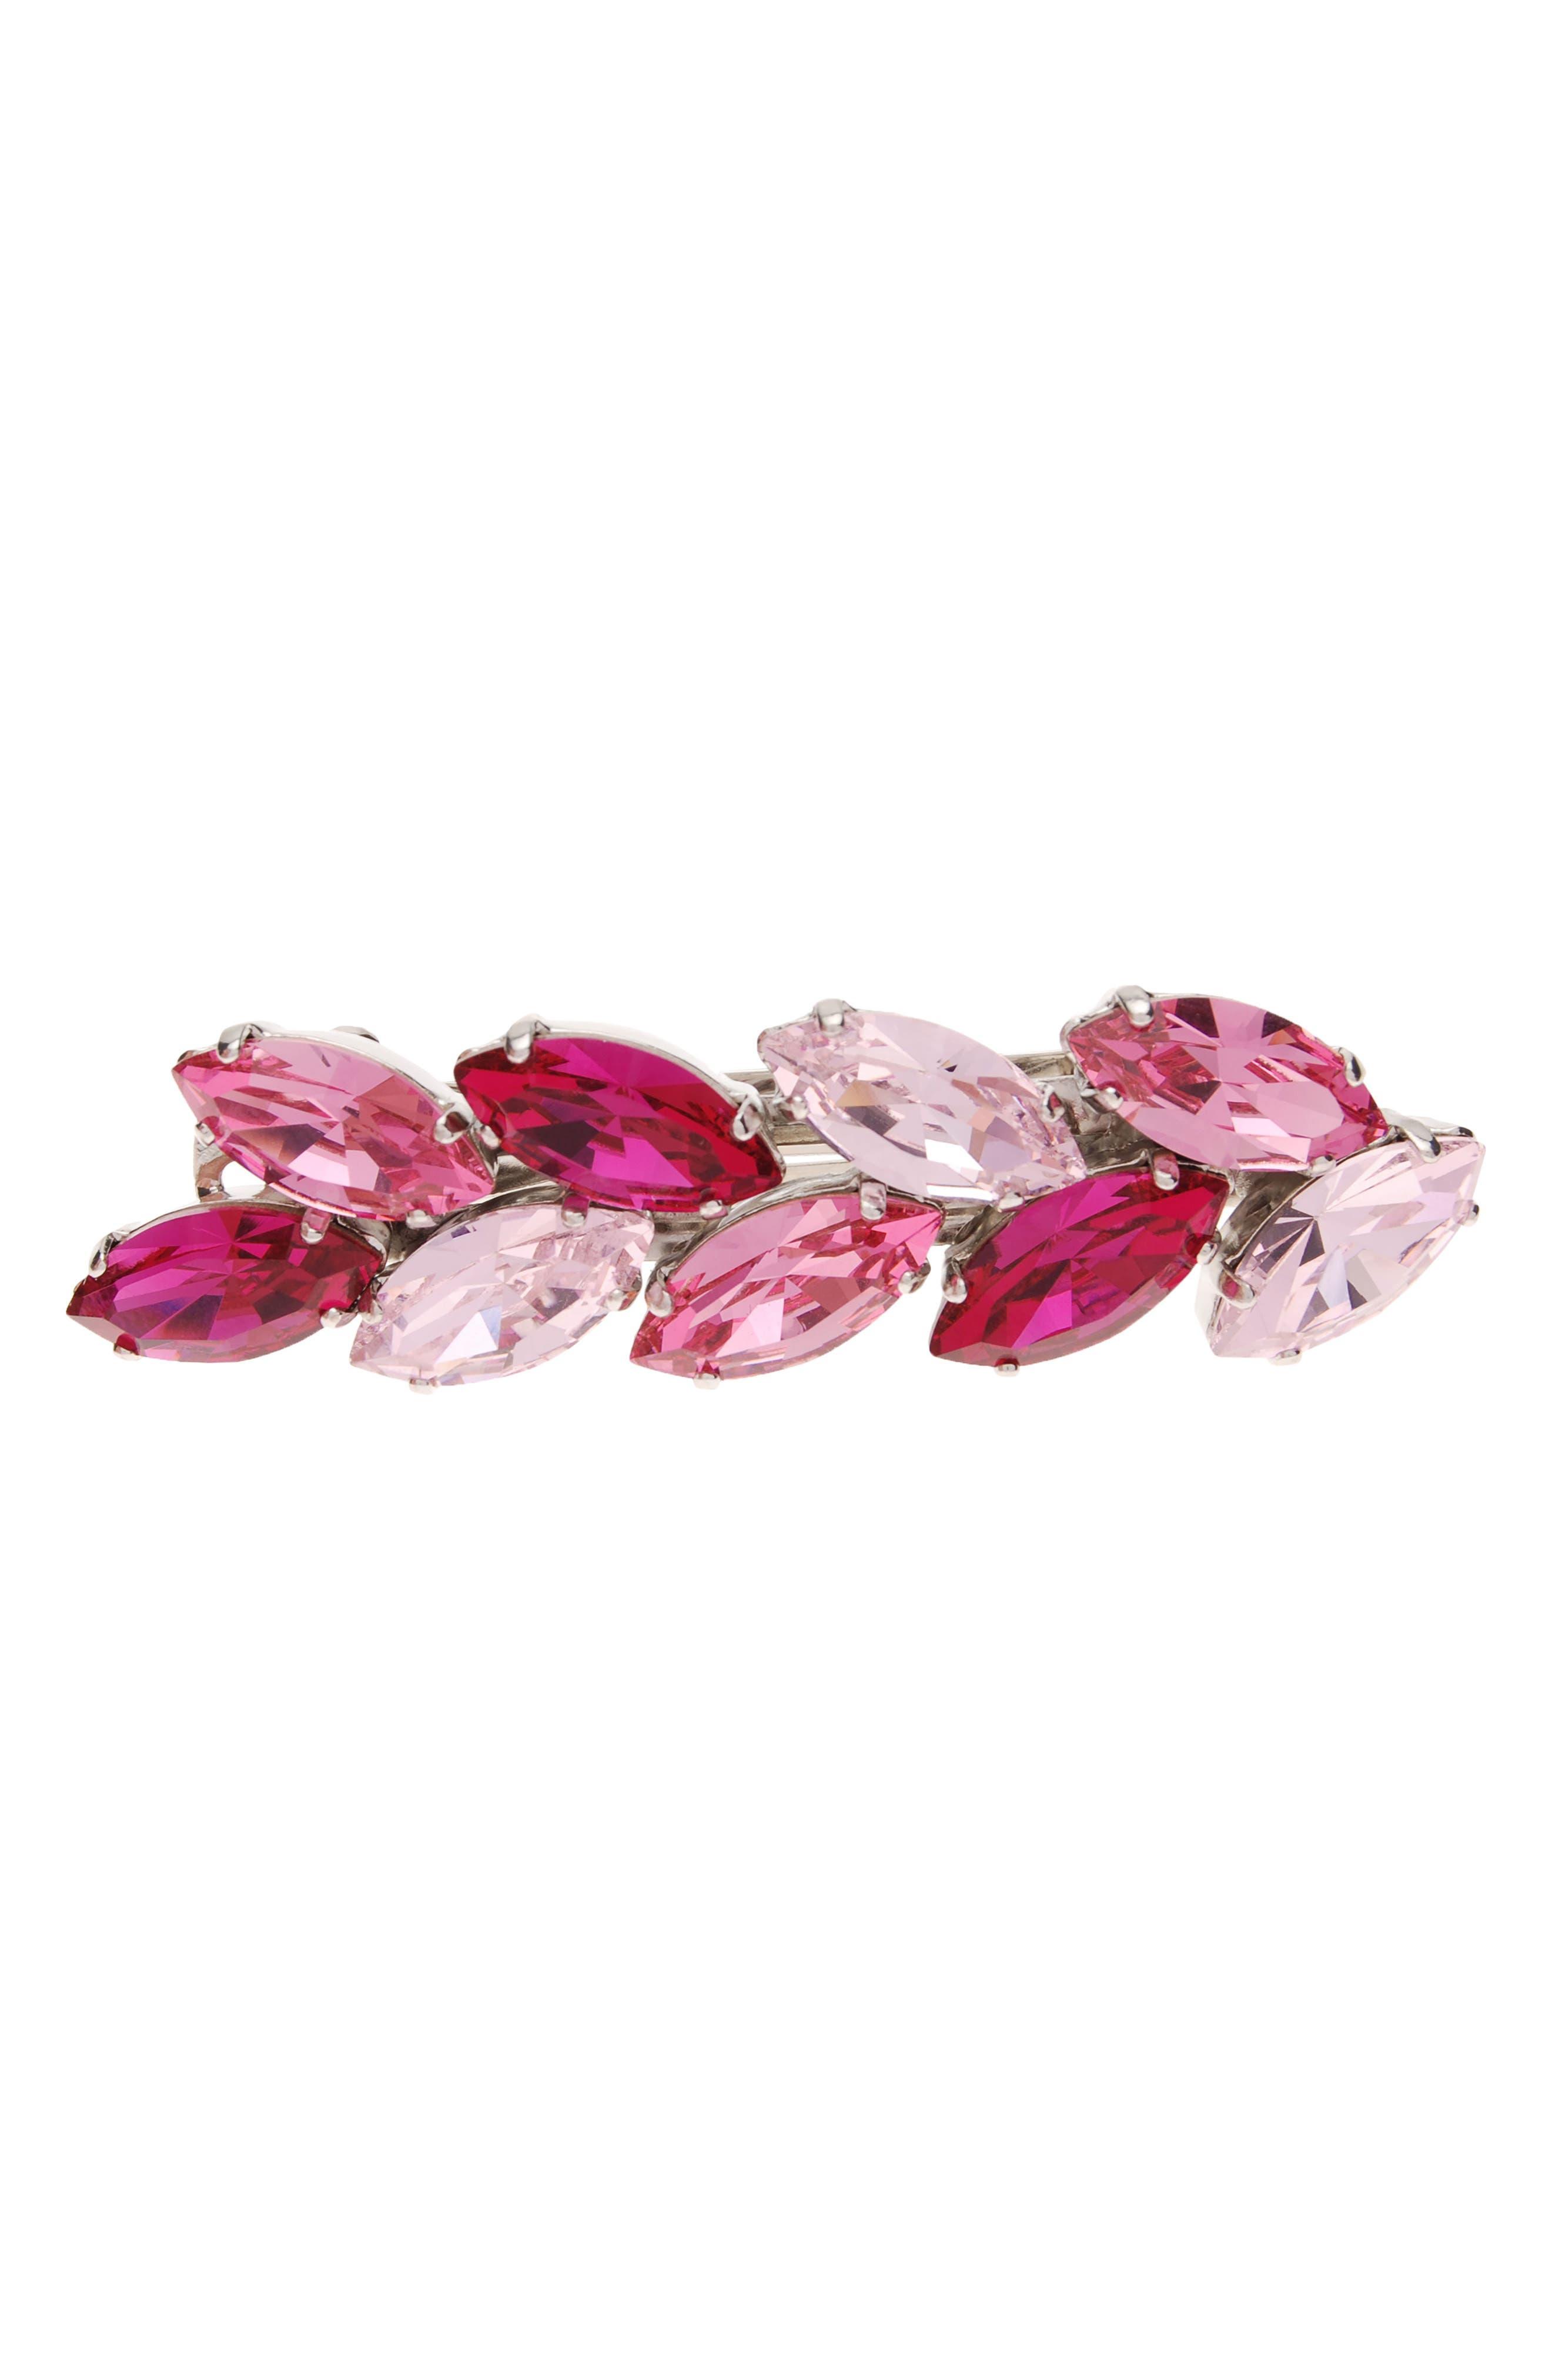 Small Ivy Swarovski Crystal Barrette,                             Main thumbnail 1, color,                             Fuchsia/ Rosline